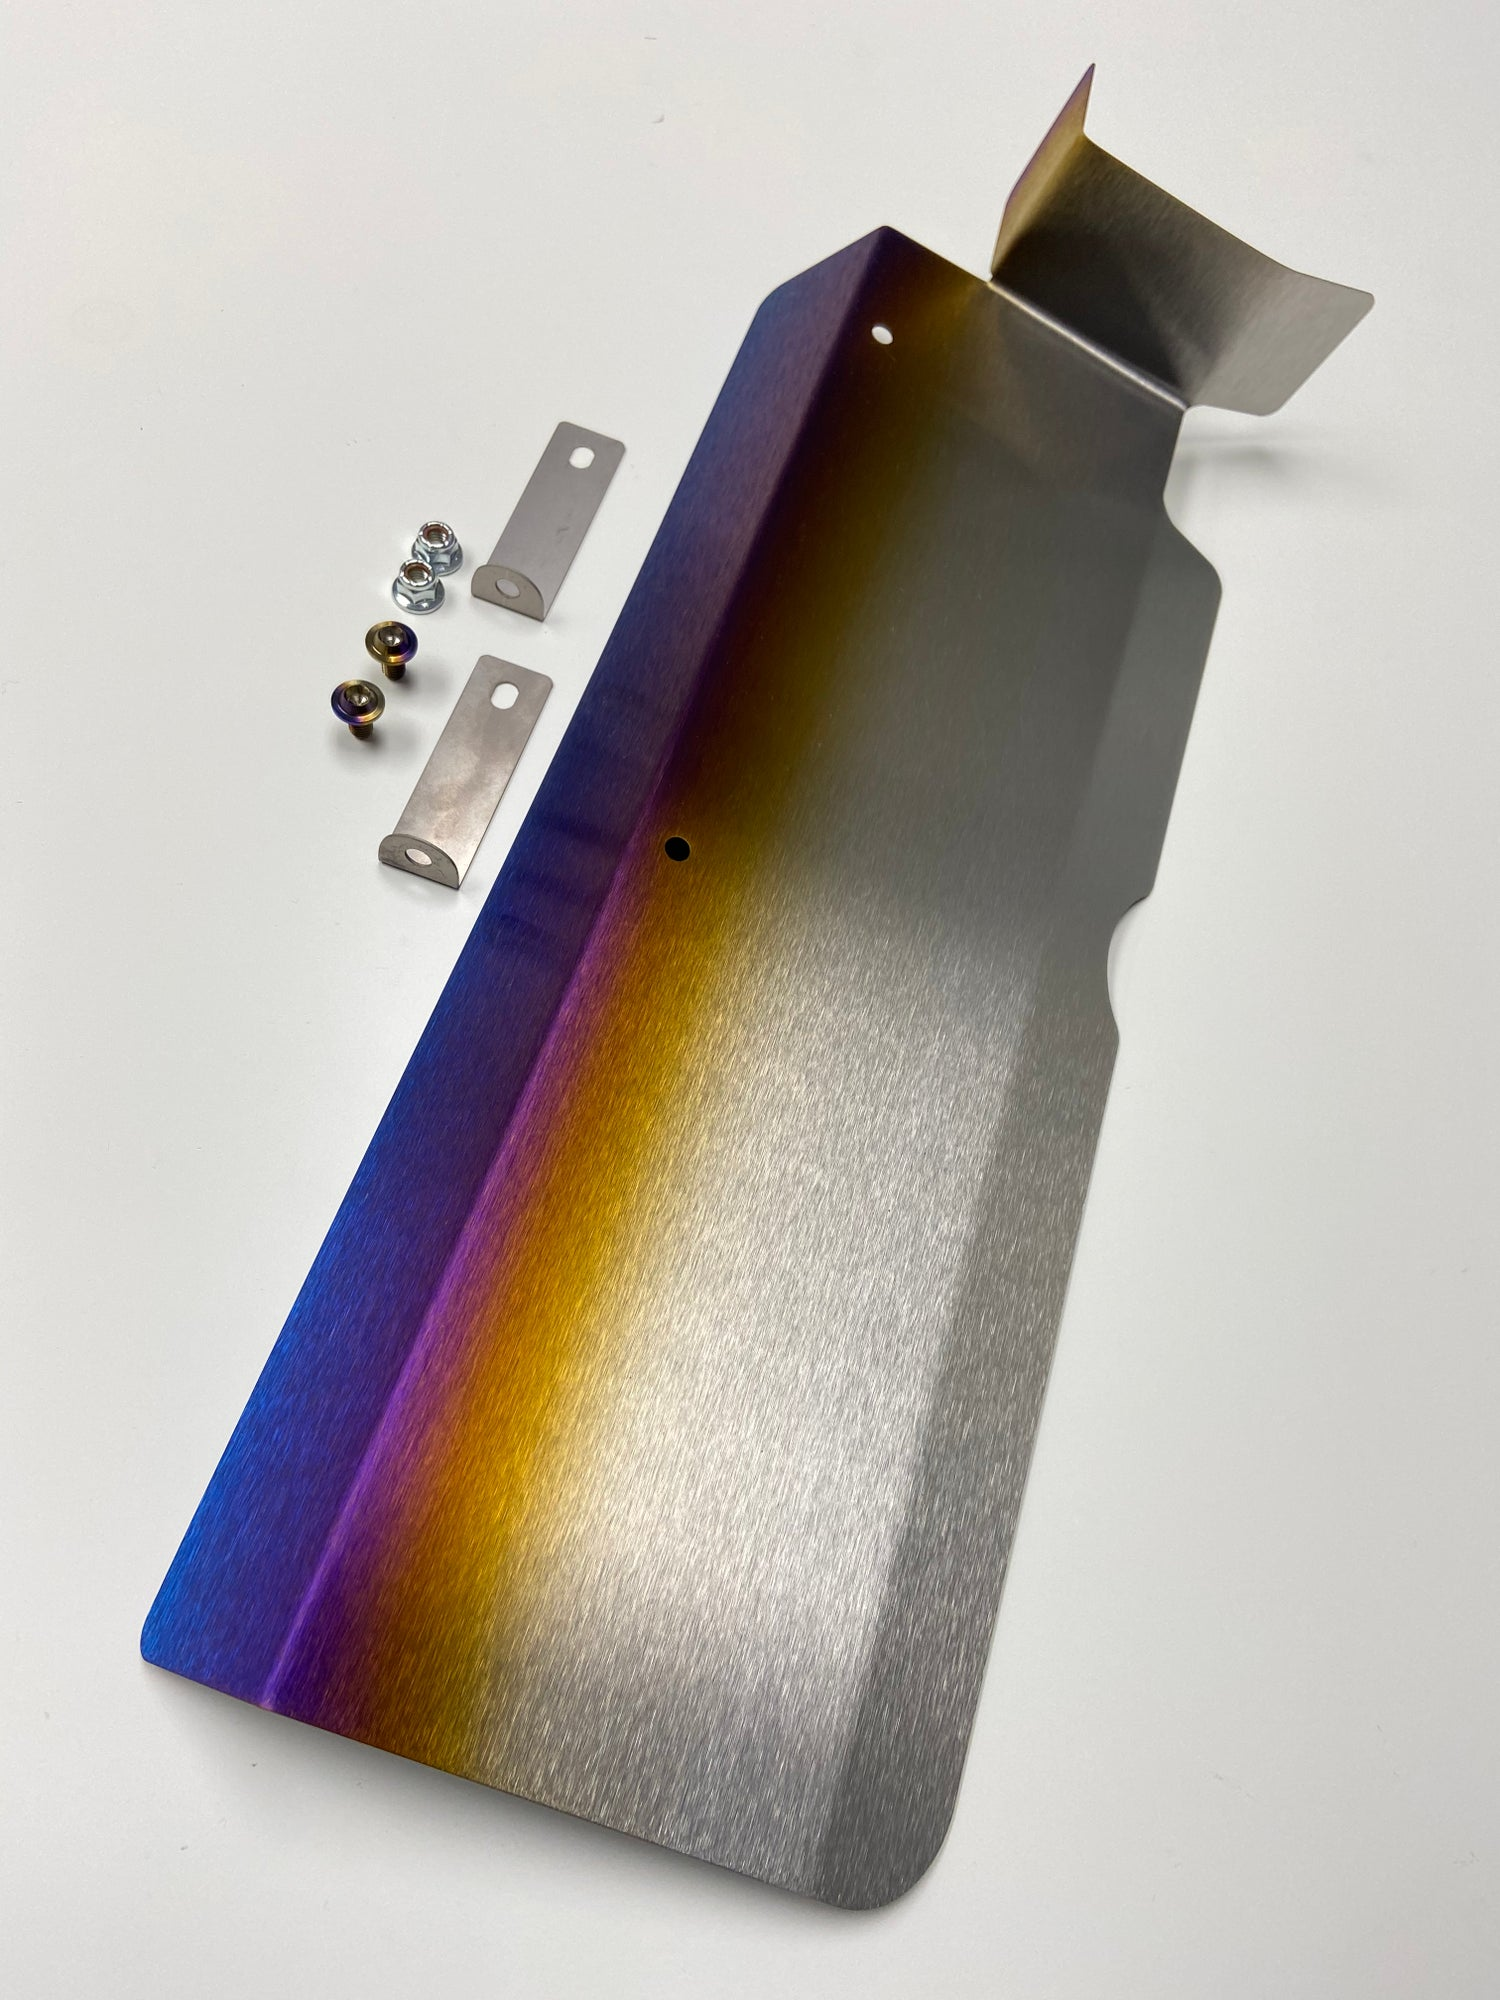 Image of Mitsubishi Evo 8/9 titanium valve cover and cam position heatshield.